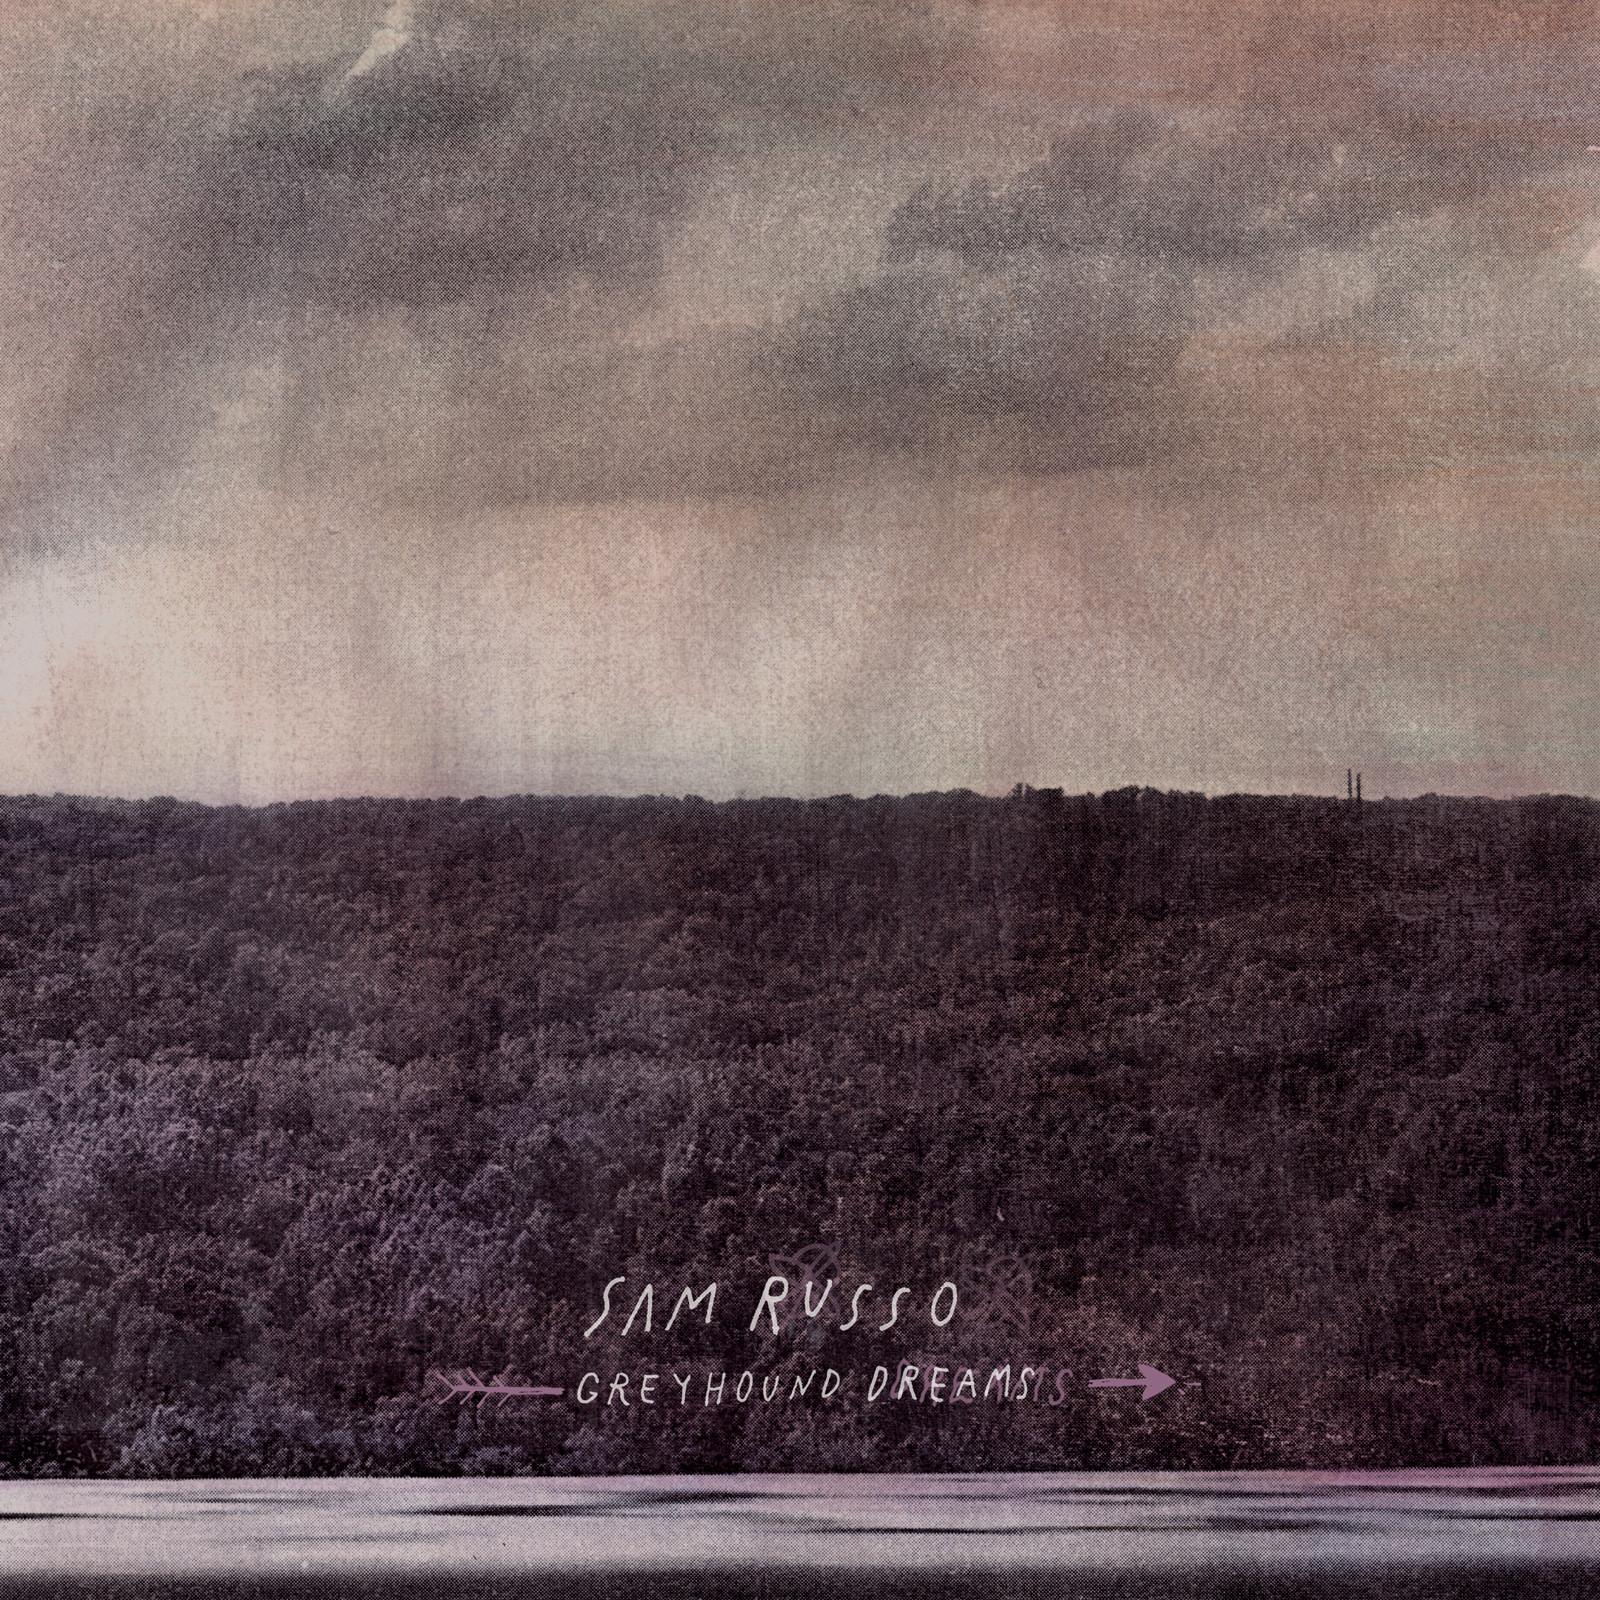 Sam Russo - Greyhound Dreams LP / CD